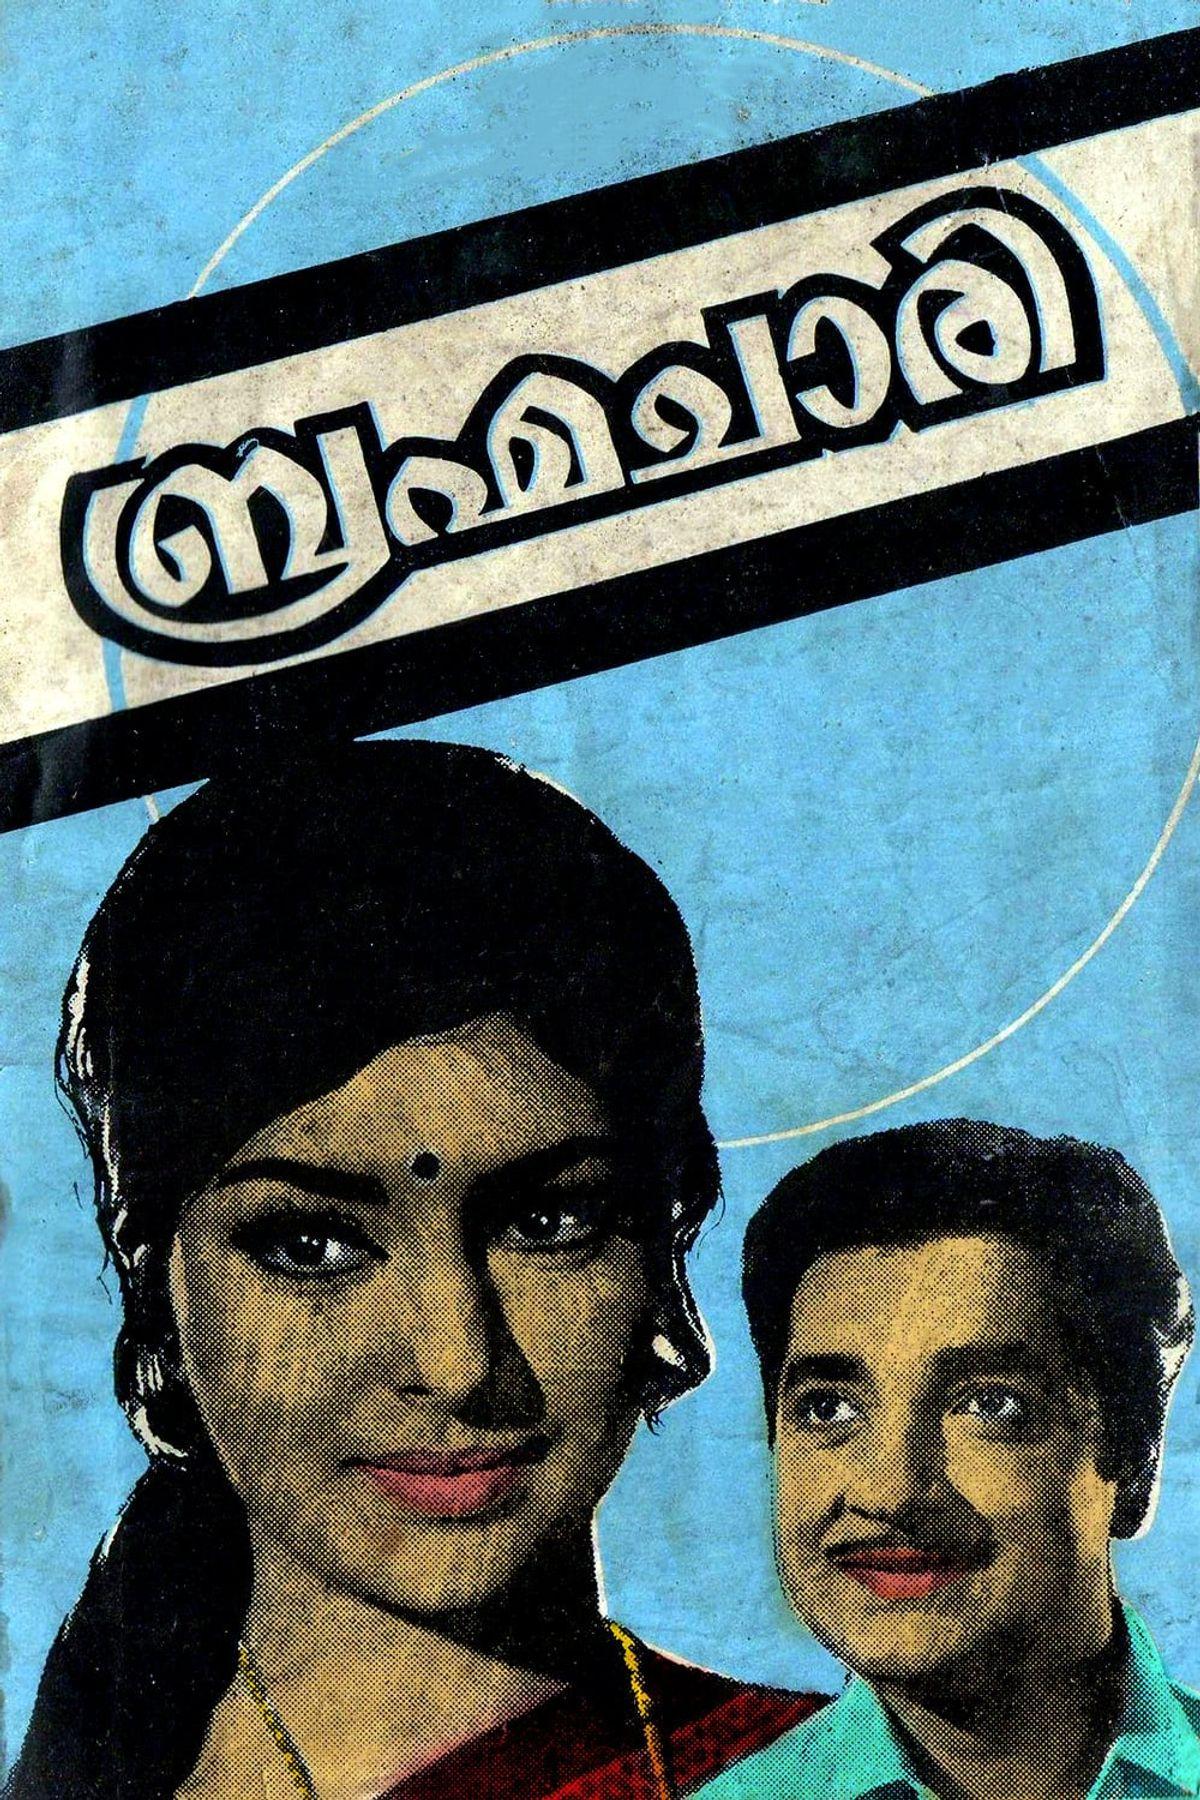 Oolan Ramu Best Movies, TV Shows and Web Series List